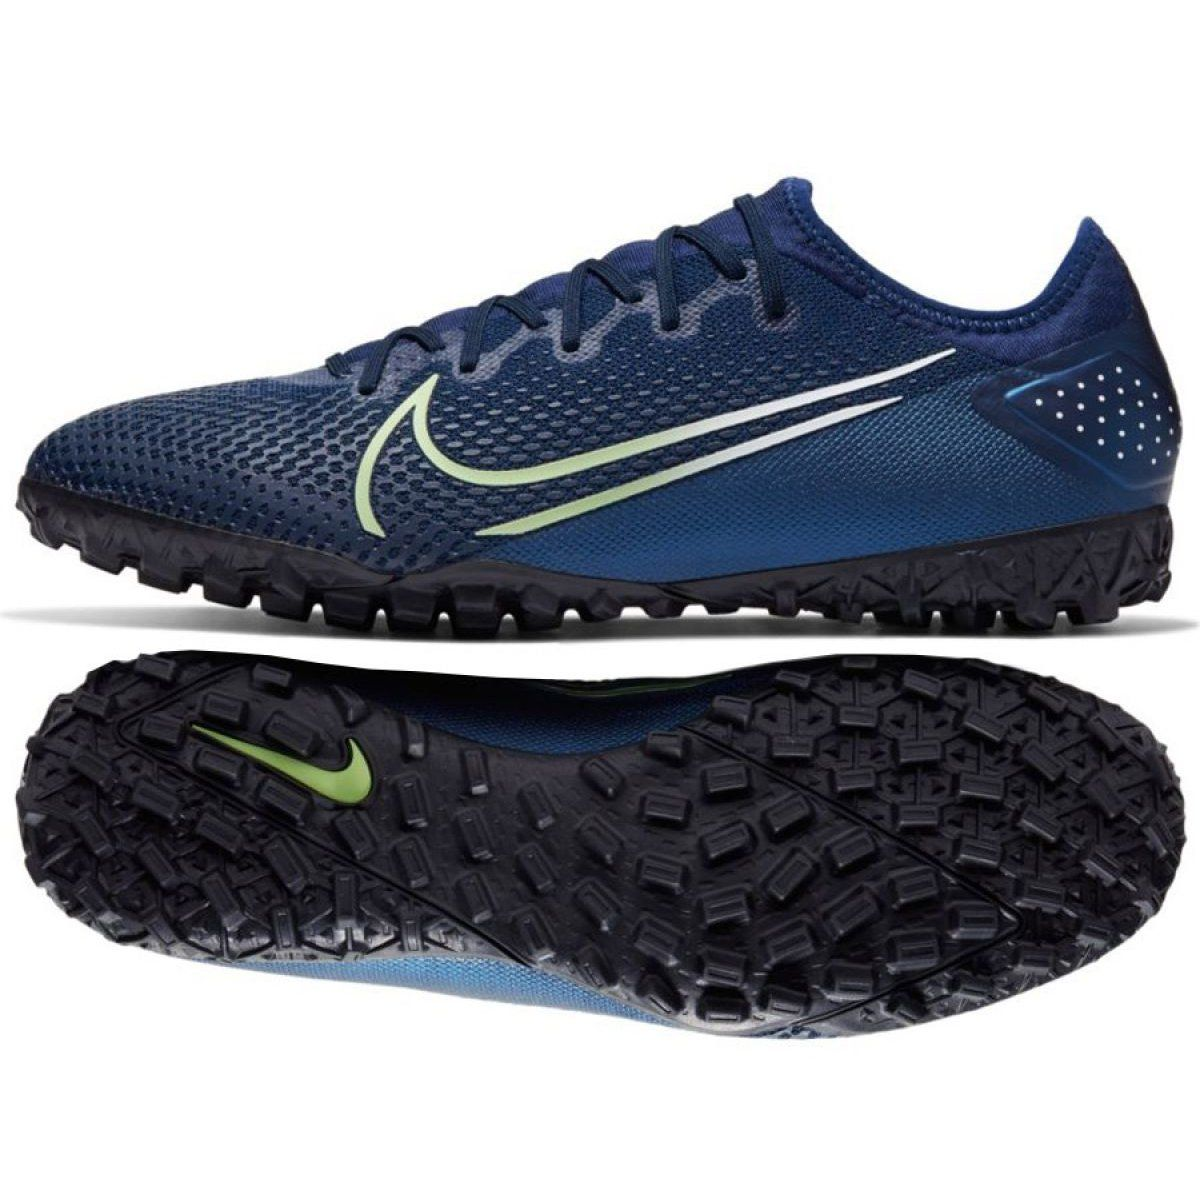 Buty Pilkarskie Nike Mercurial Vapor 13 Pro Mds Tf M Cj1307 401 Granatowe Wielokolorowe Football Shoes Nike Nike Soccer Shoes